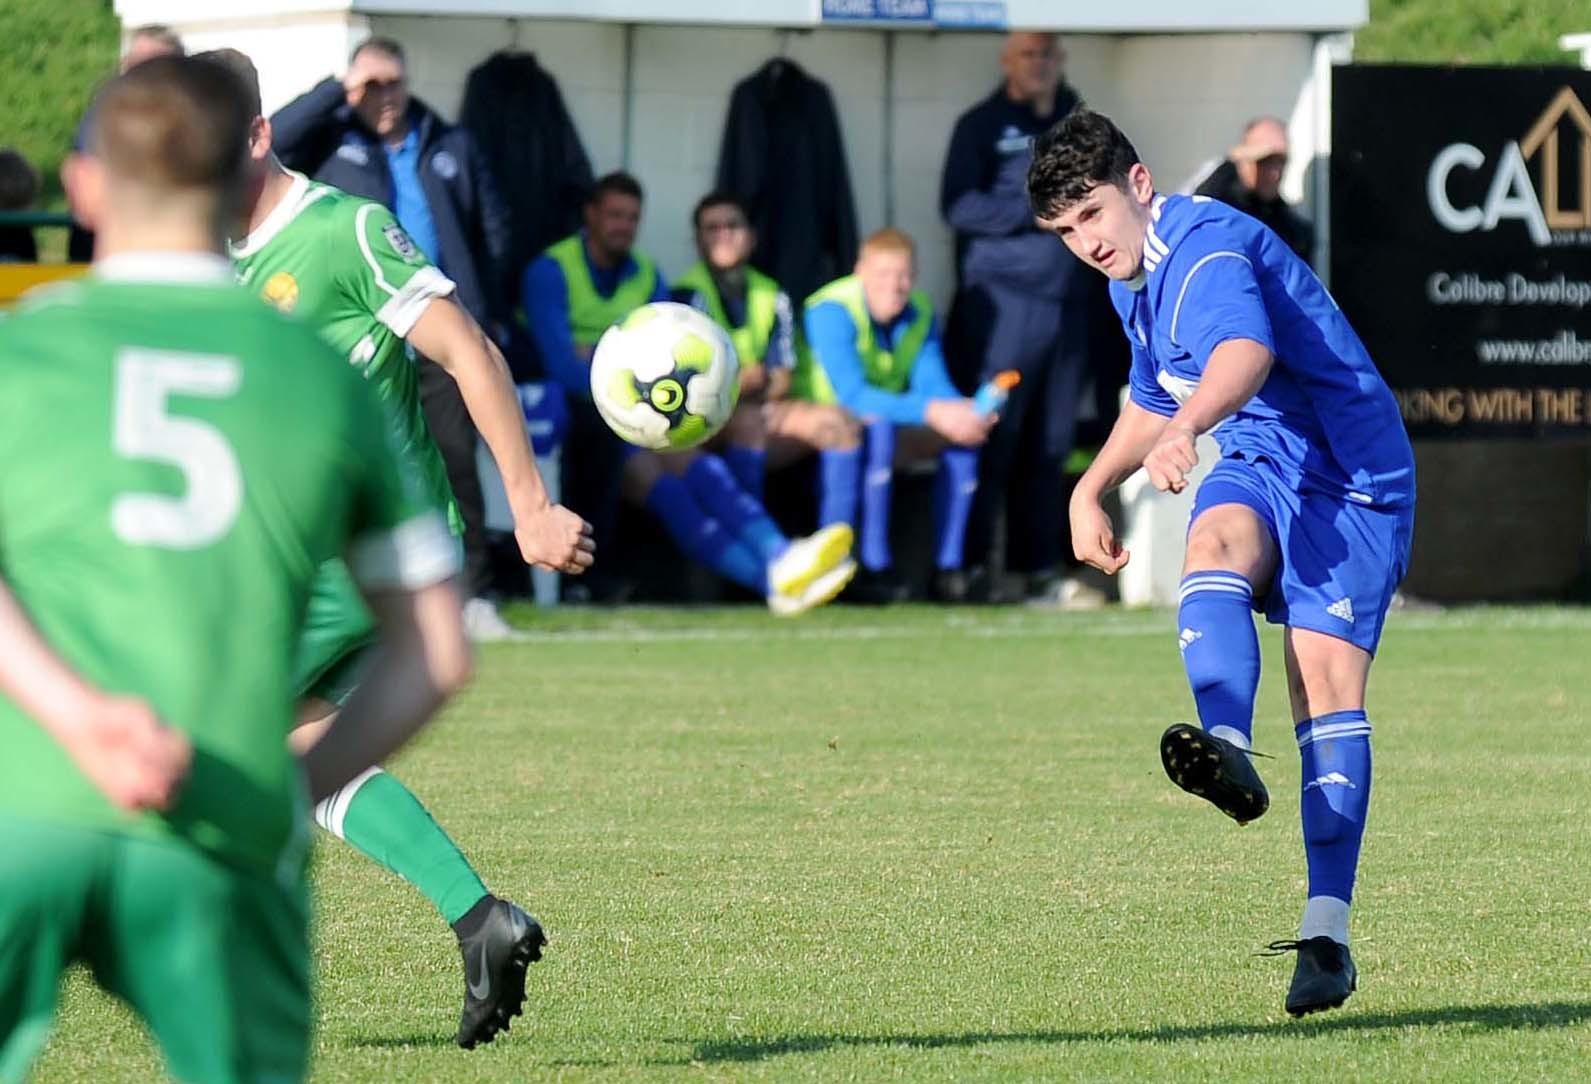 Football: Portland sign Weymouth keeper Tom Rees ahead of Fleet test - Dorset Echo